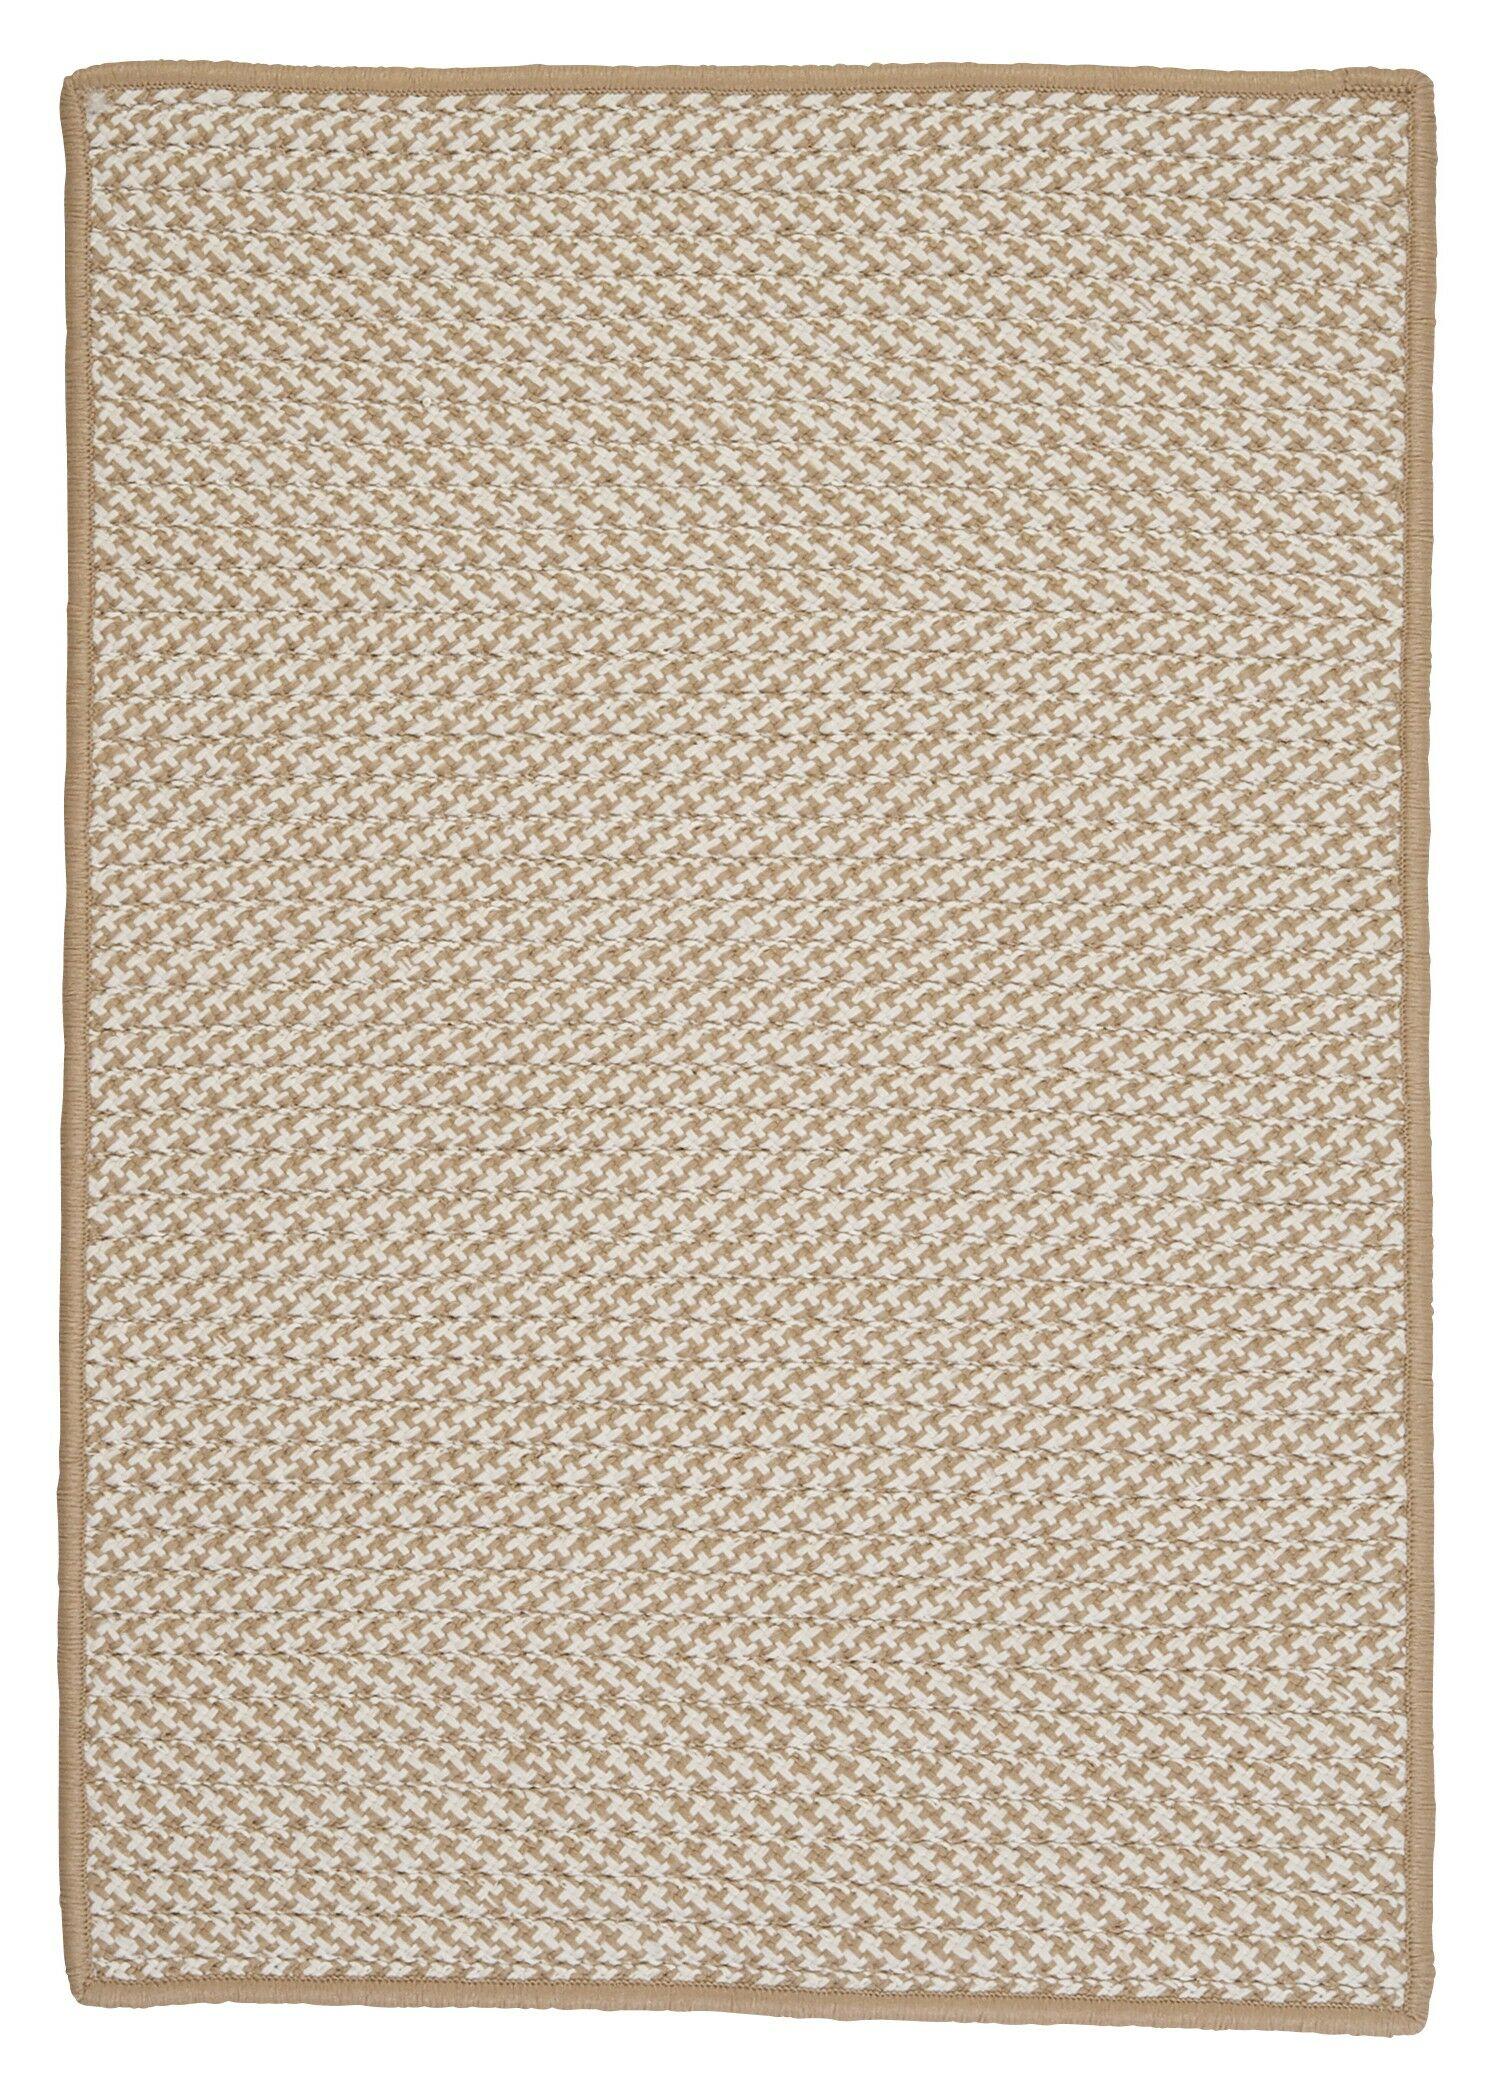 Outdoor Houndstooth Tweed Cuban Sand Rug Rug Size: Rectangle 4' x 6'